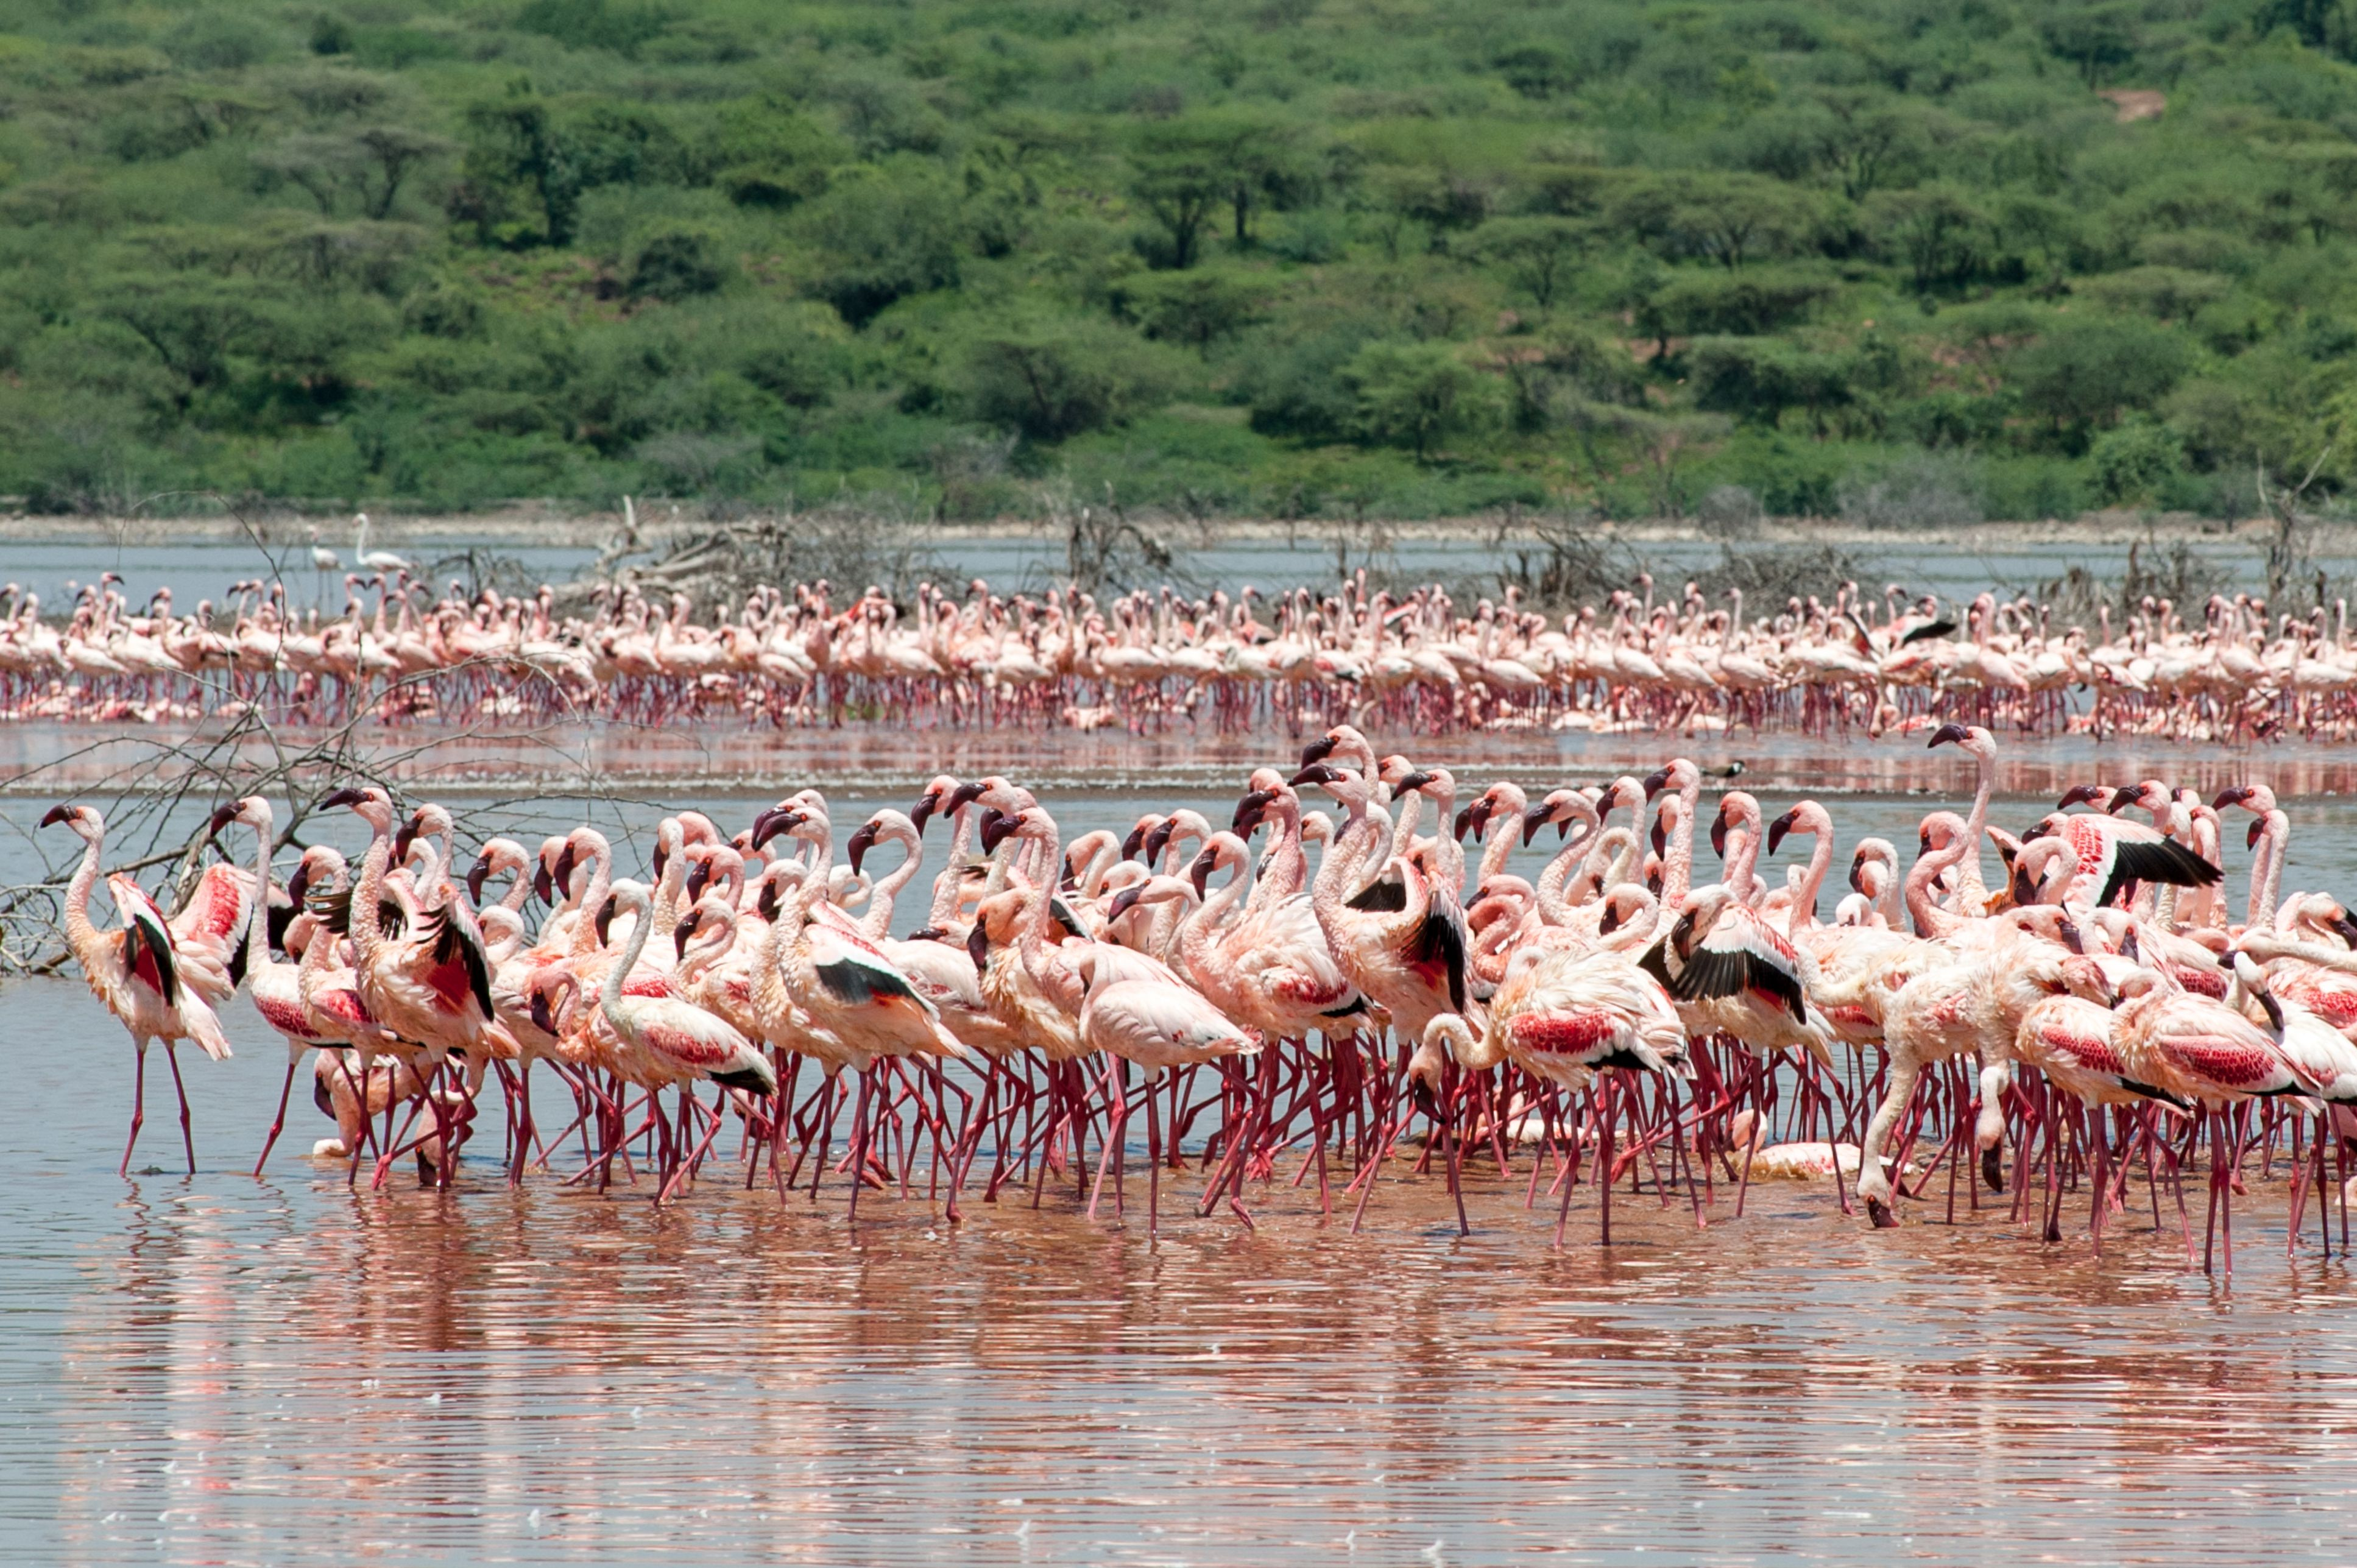 Less flamingoes